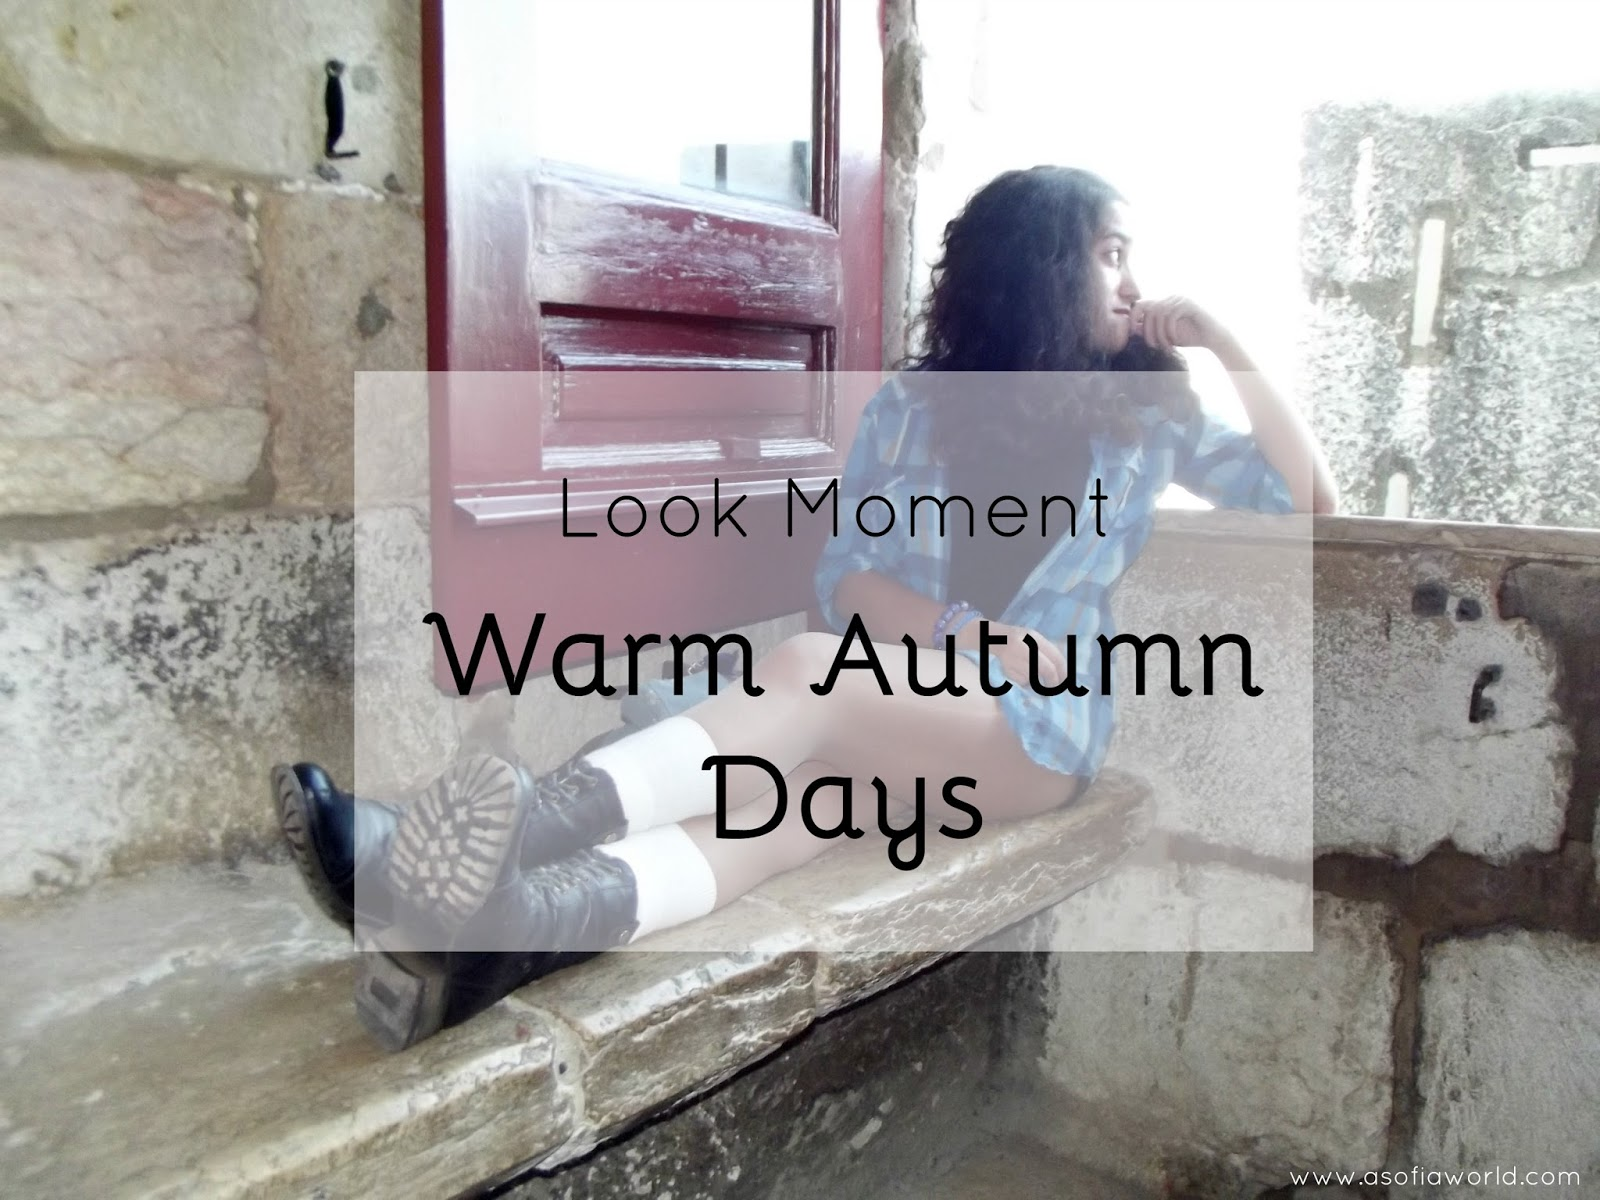 Warm Autumn Days inspiration.